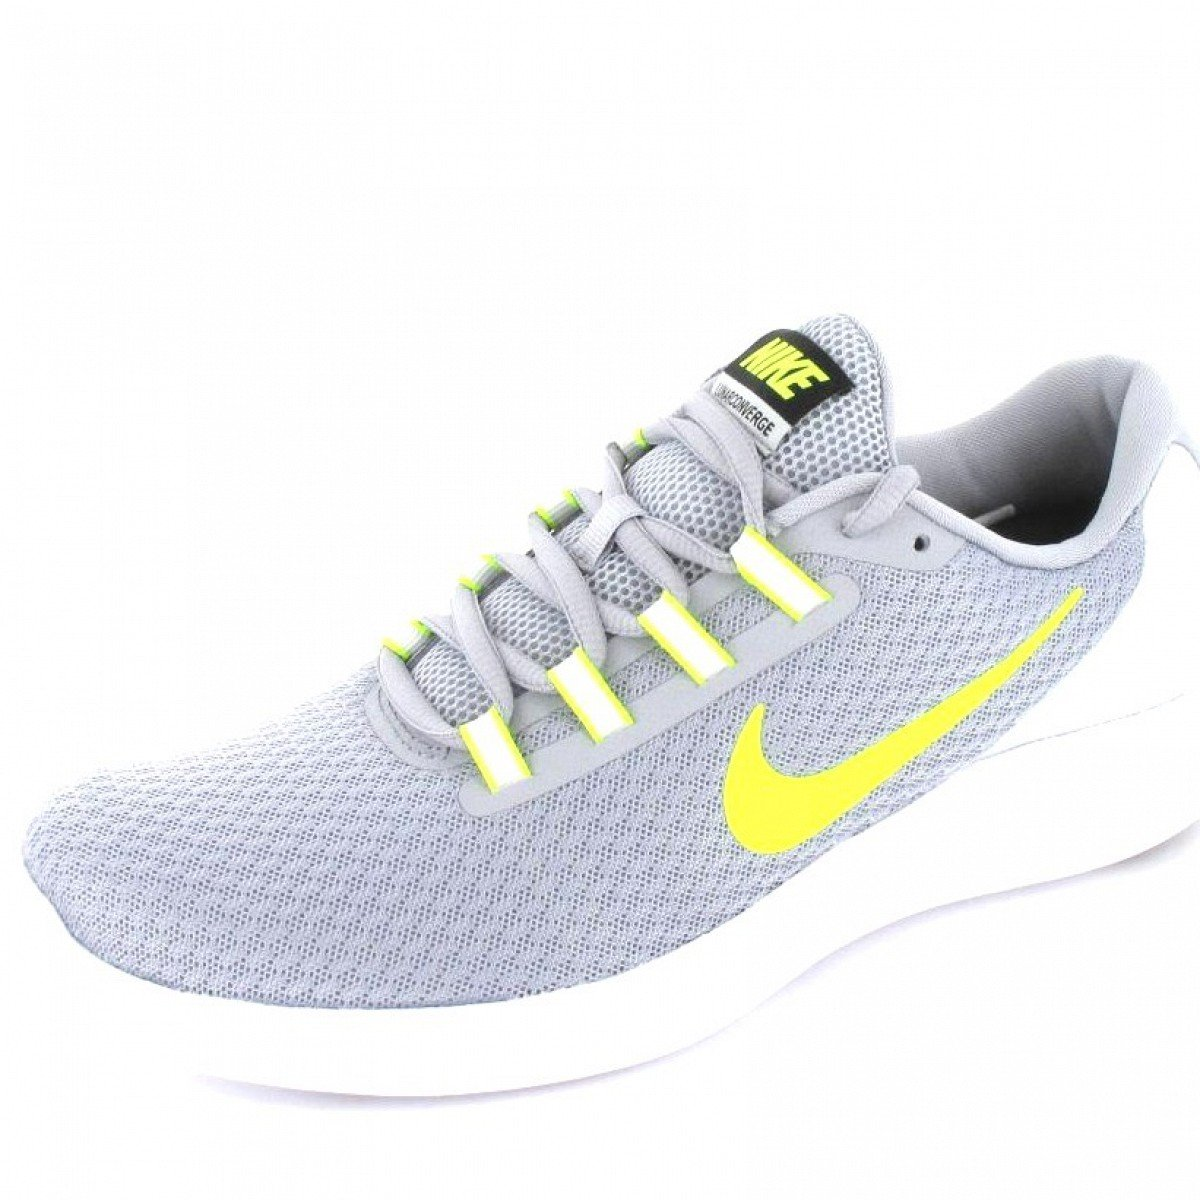 NIKE Men's Lunarconverge Running Shoes B01N6X8SK9 11.5 D(M) US|Wolf Grey/Volt/Pure Platinum/White